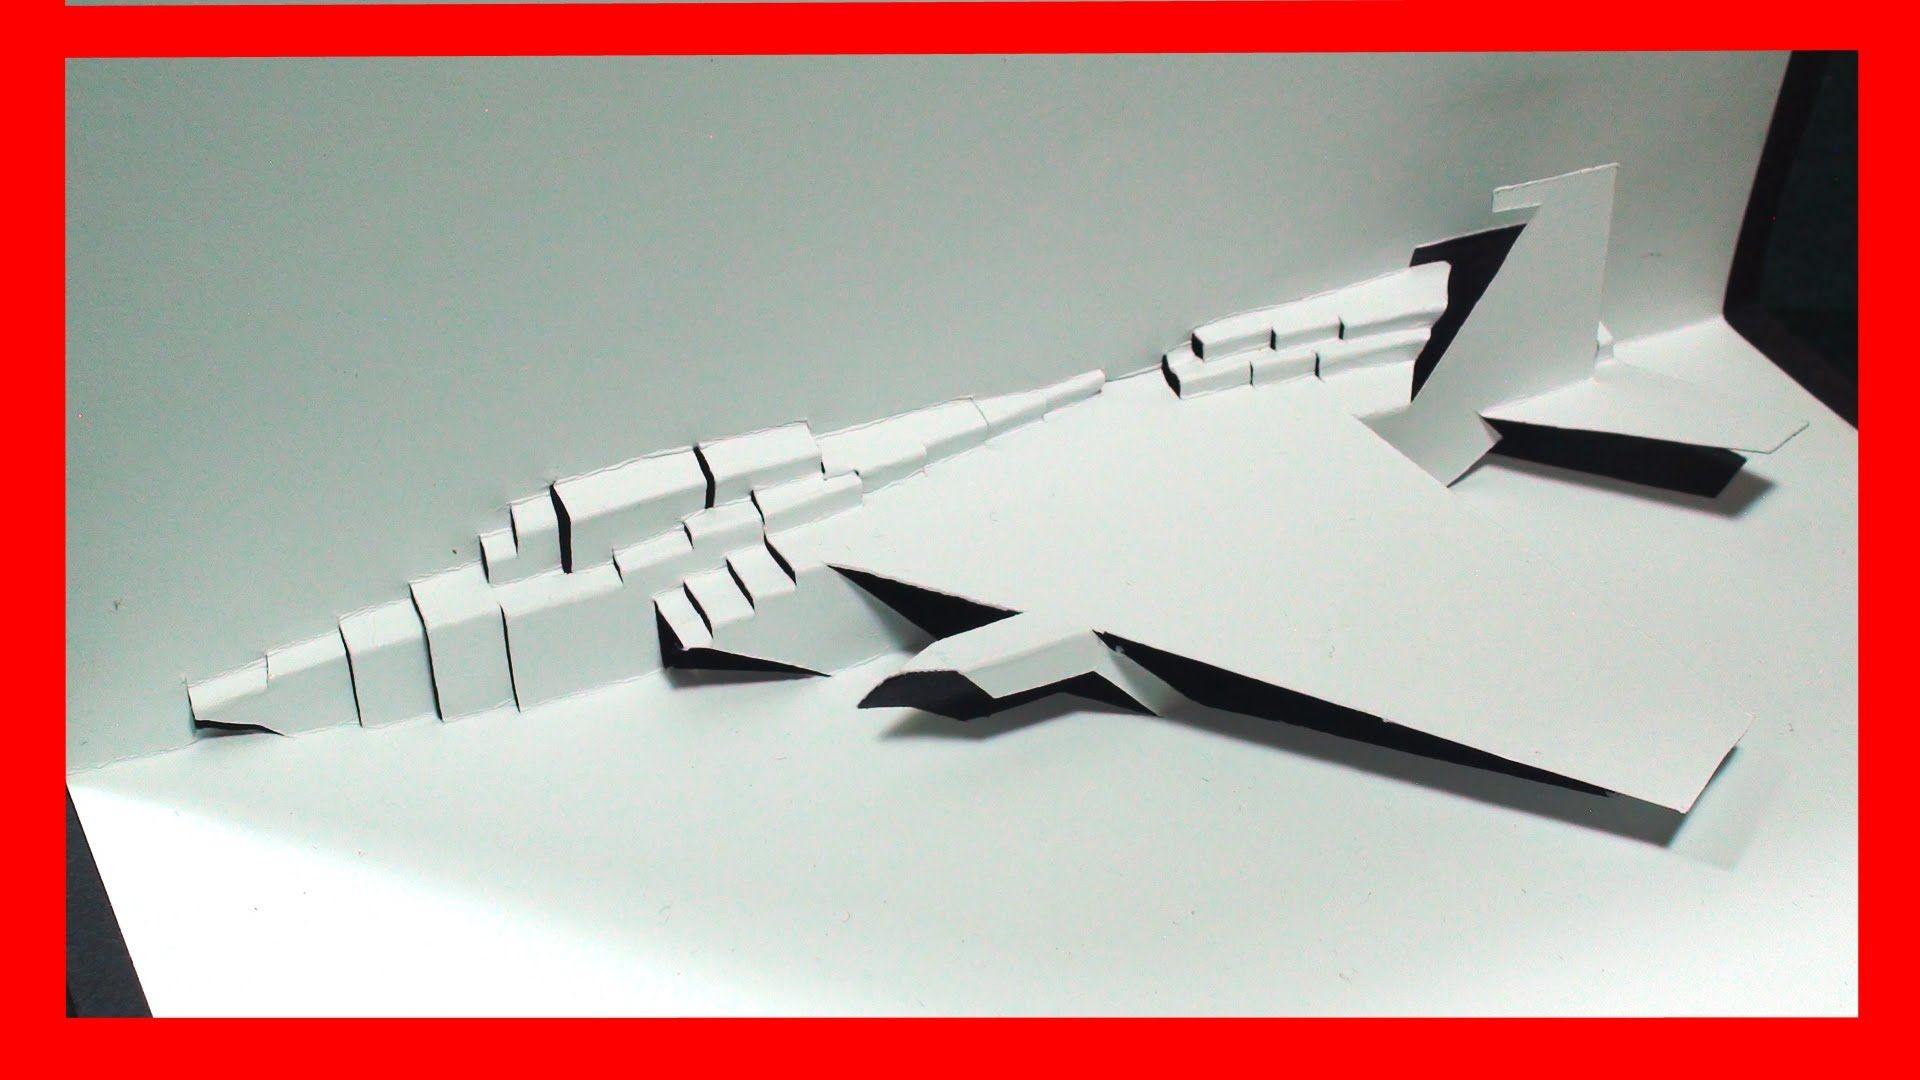 Papercraft Jet F 15 Fighter Jet Pop Up Card Free Template Kirigami Hd